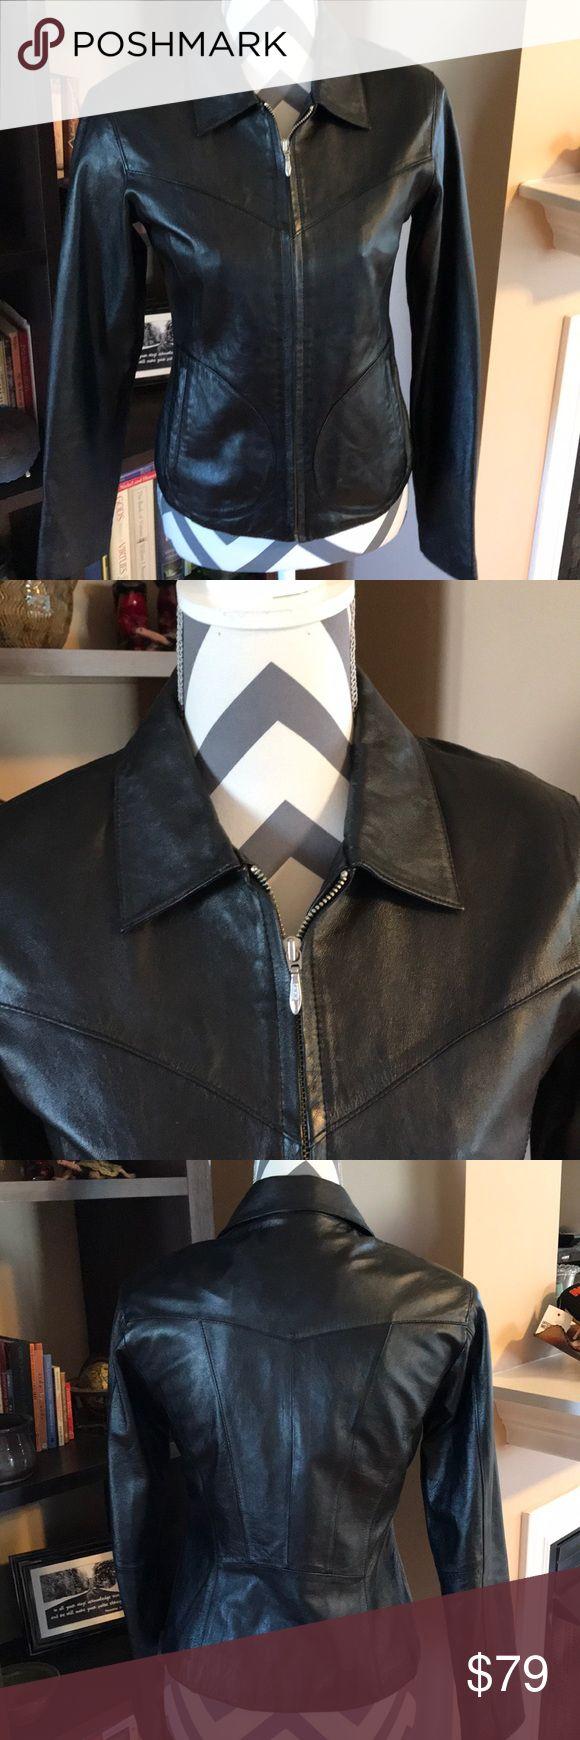 Wilsons Leather Maxima Jacket XS BLACK Wilsons Leather